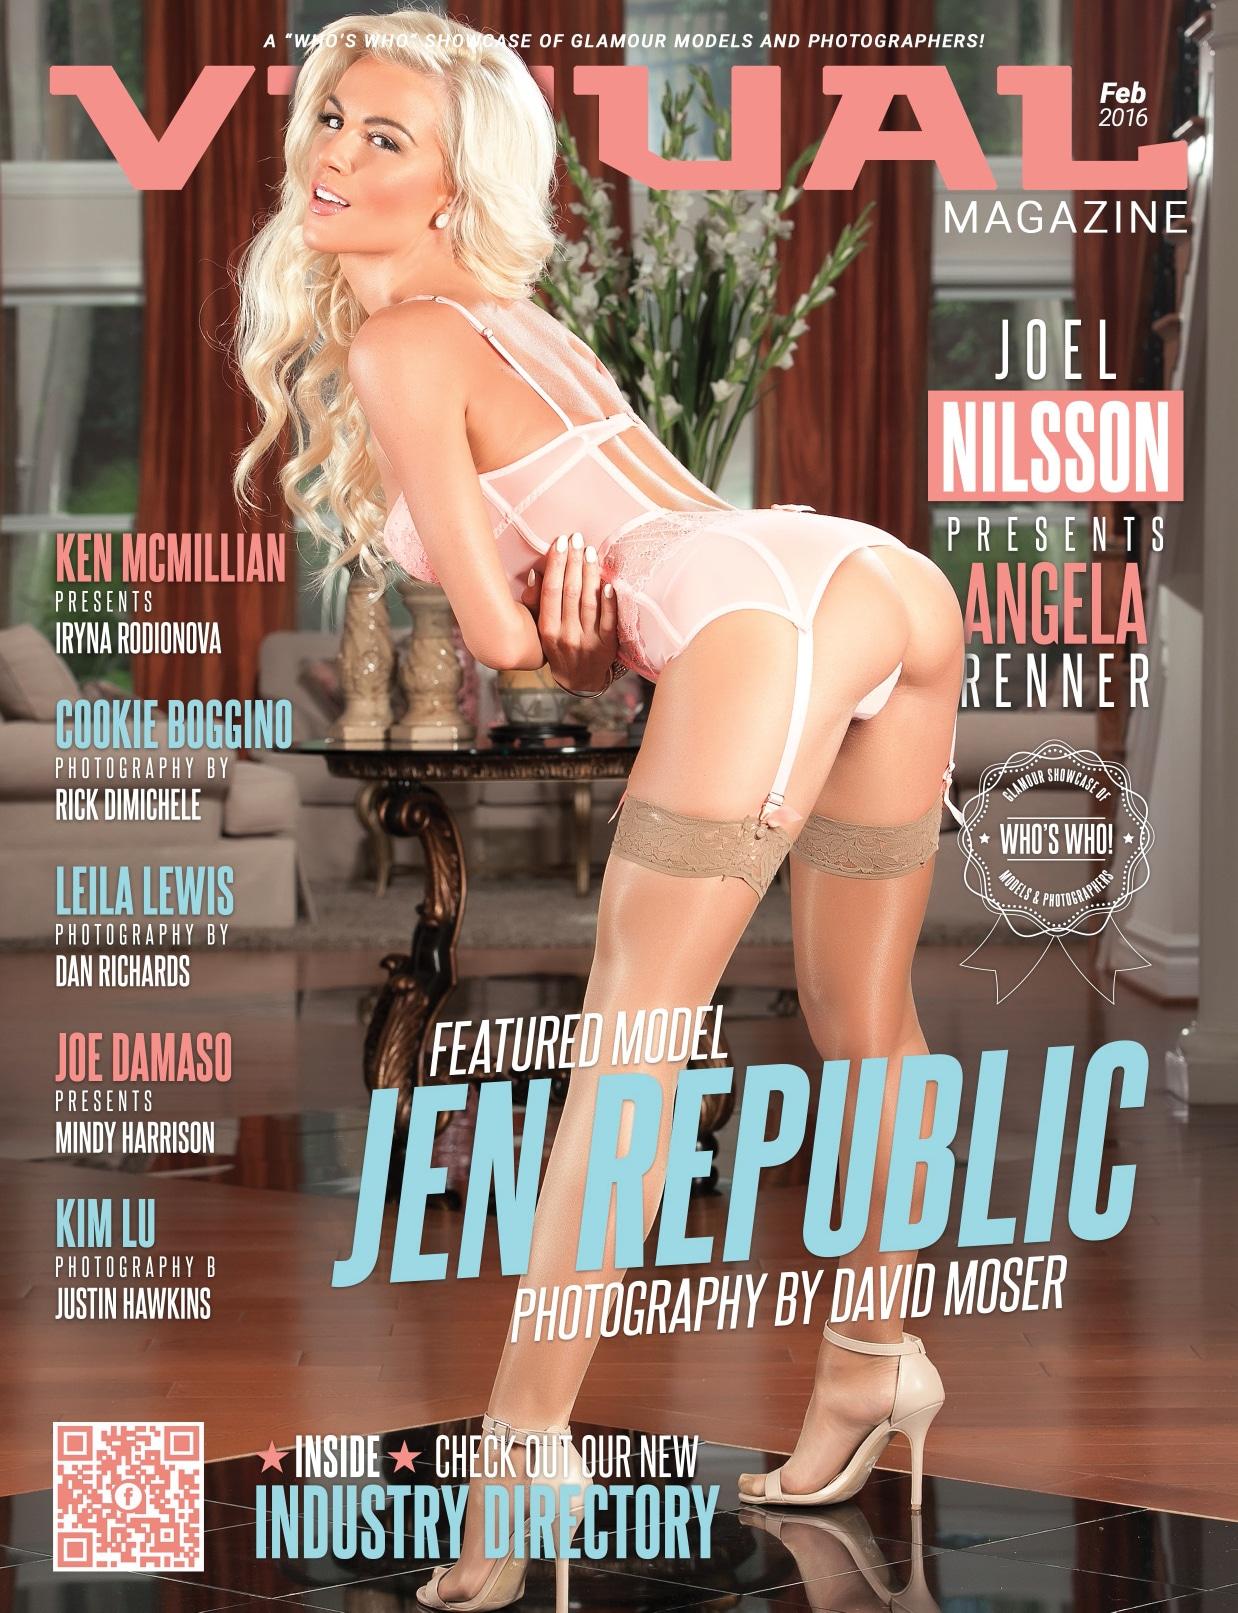 Vizual Magazine Vol 13 - February 2016 1